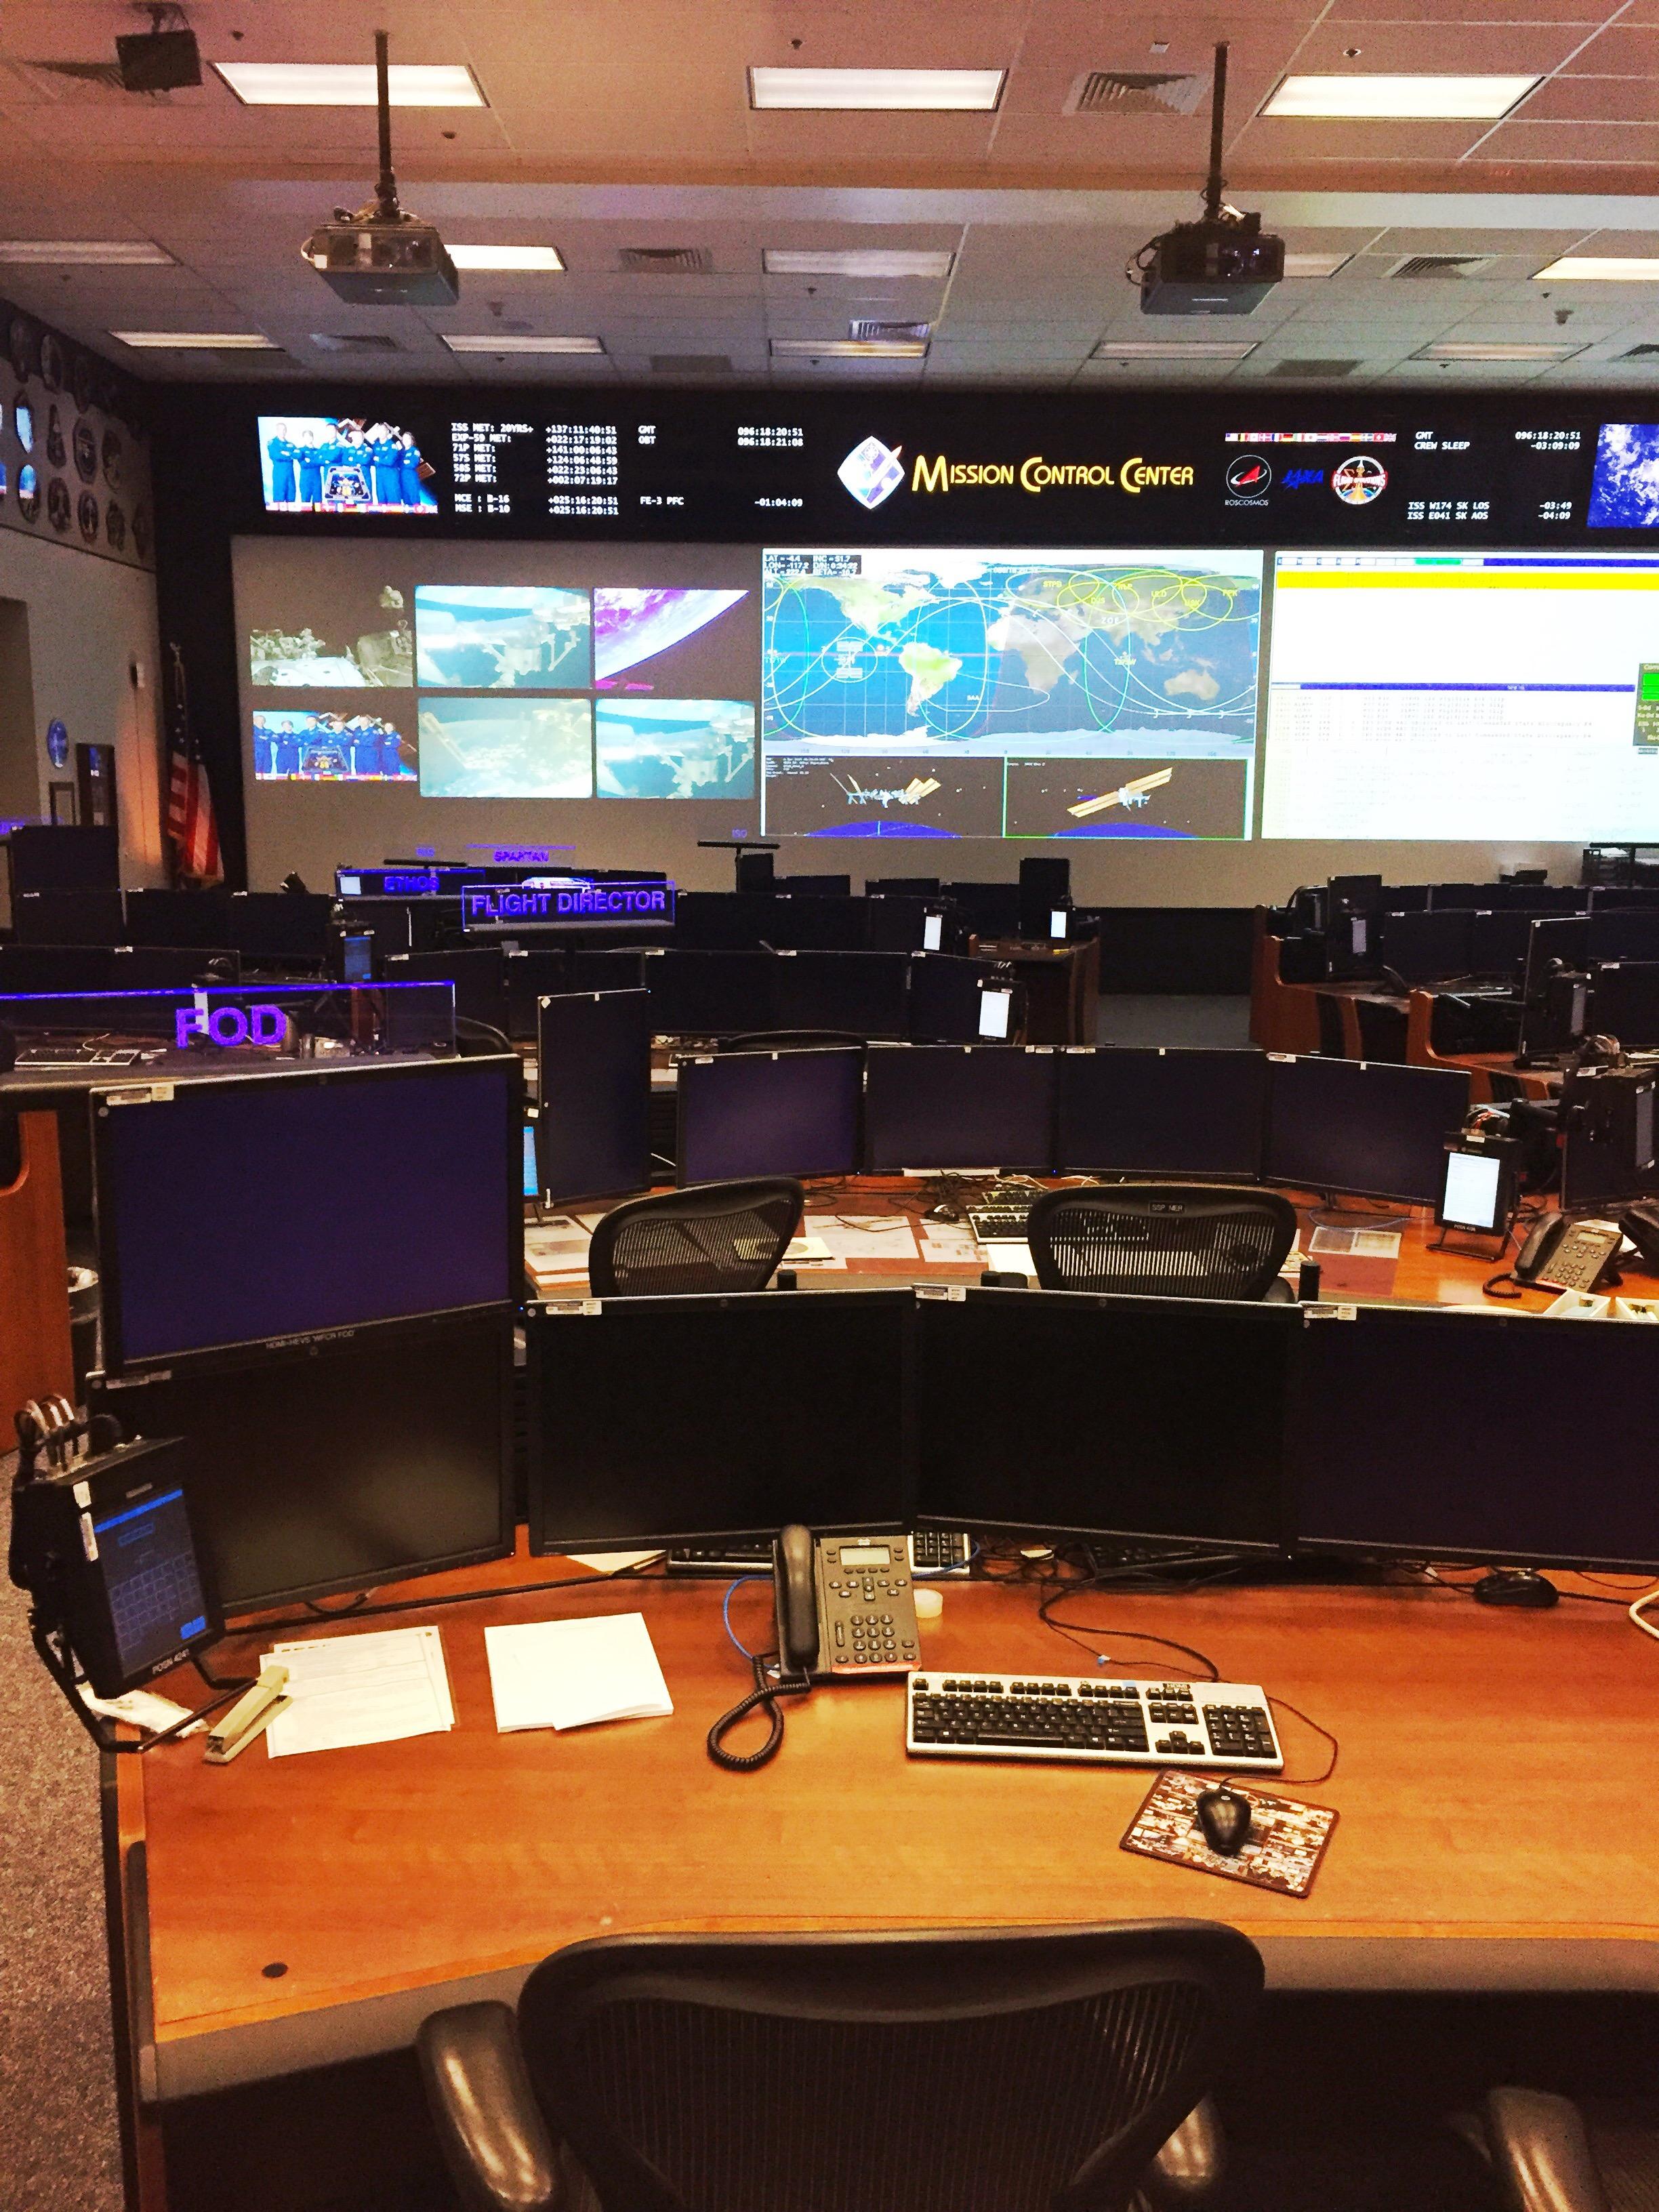 nasa houston space center mission control